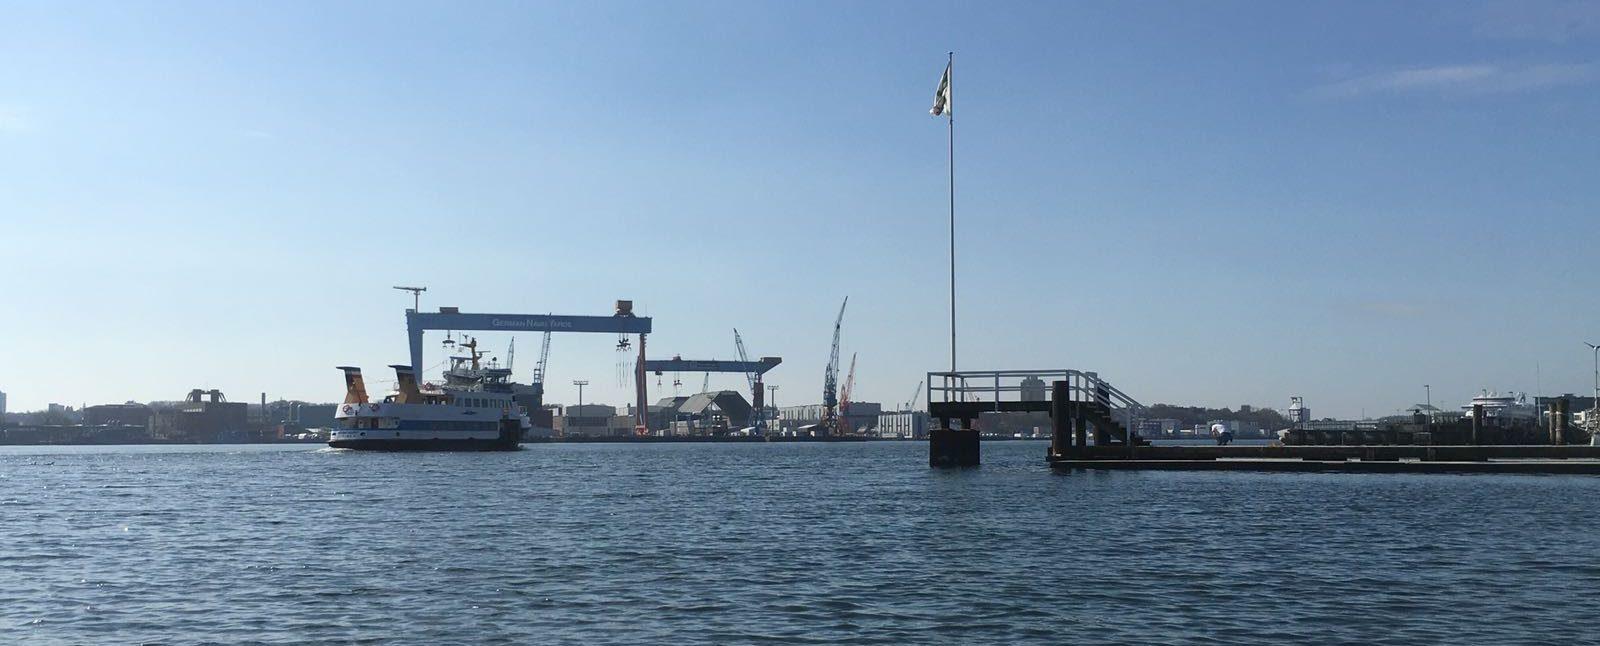 IFT 2019 Hamburg & Kiel